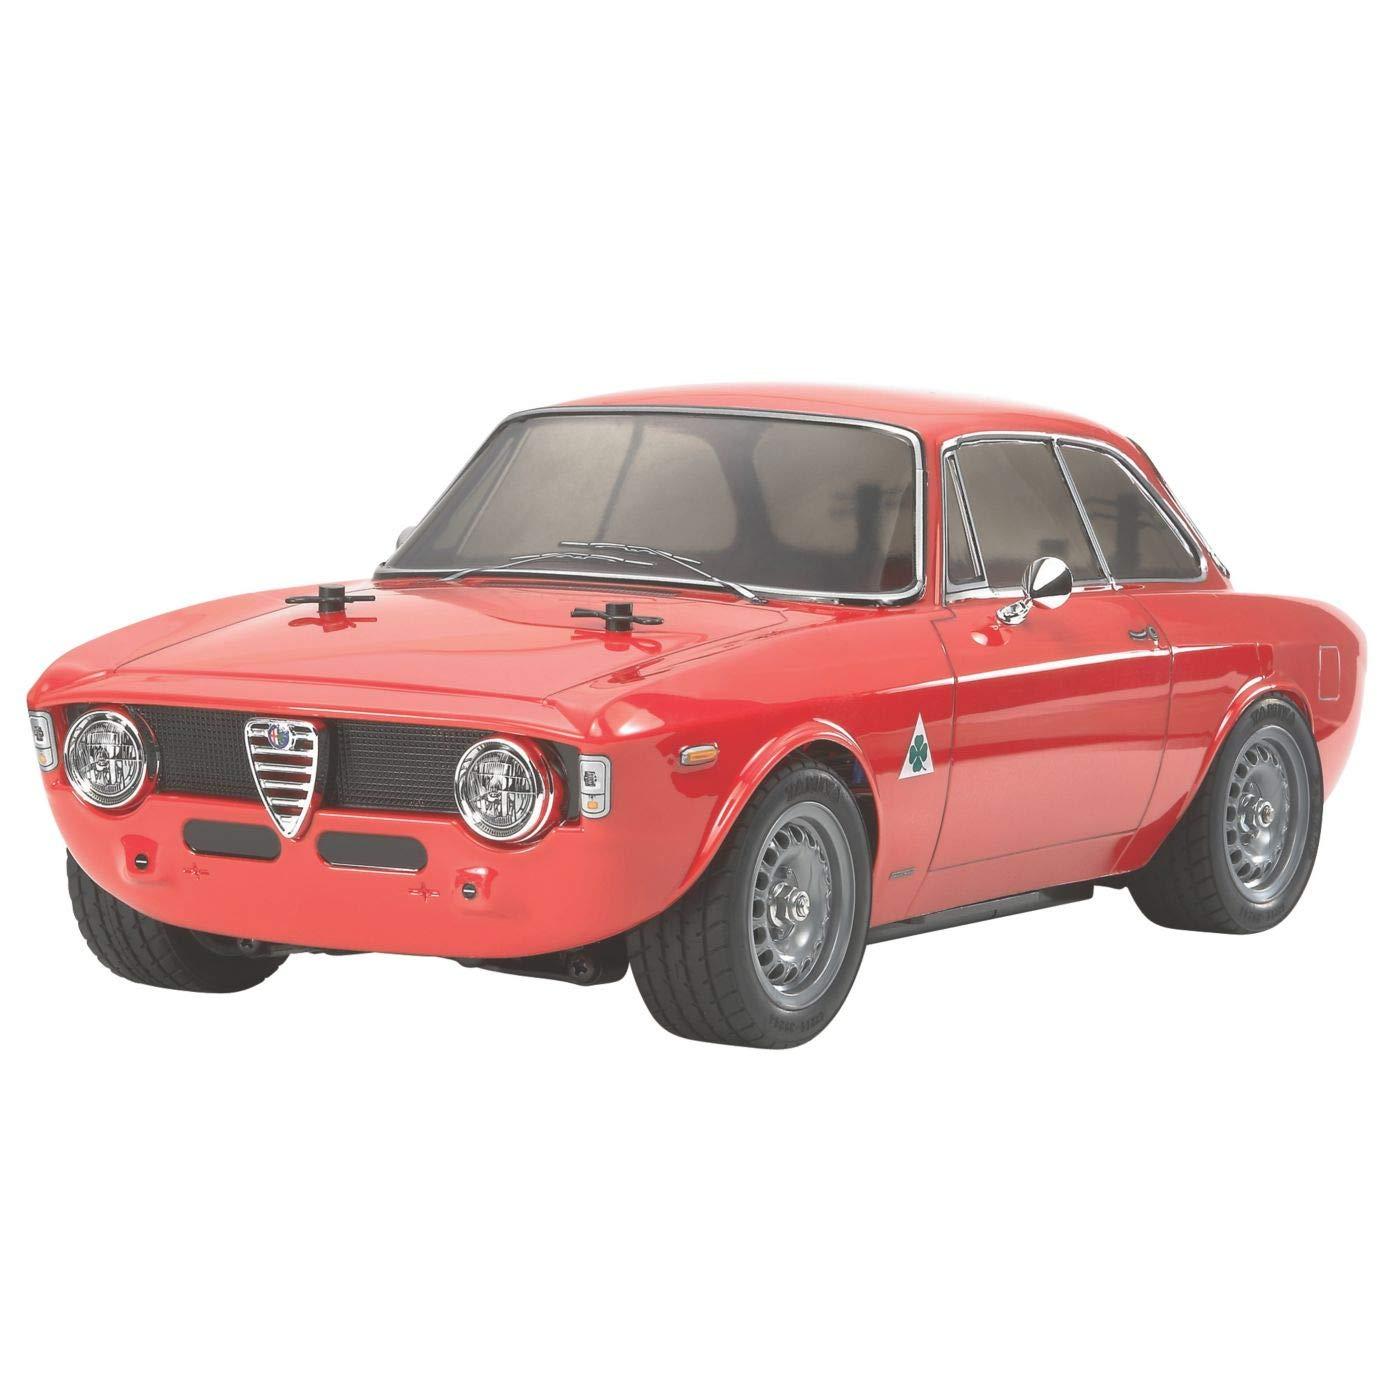 Tamiya America, Inc 1/10 Alfa Romeo Giulia Sprint Kit: M06, TAM58486